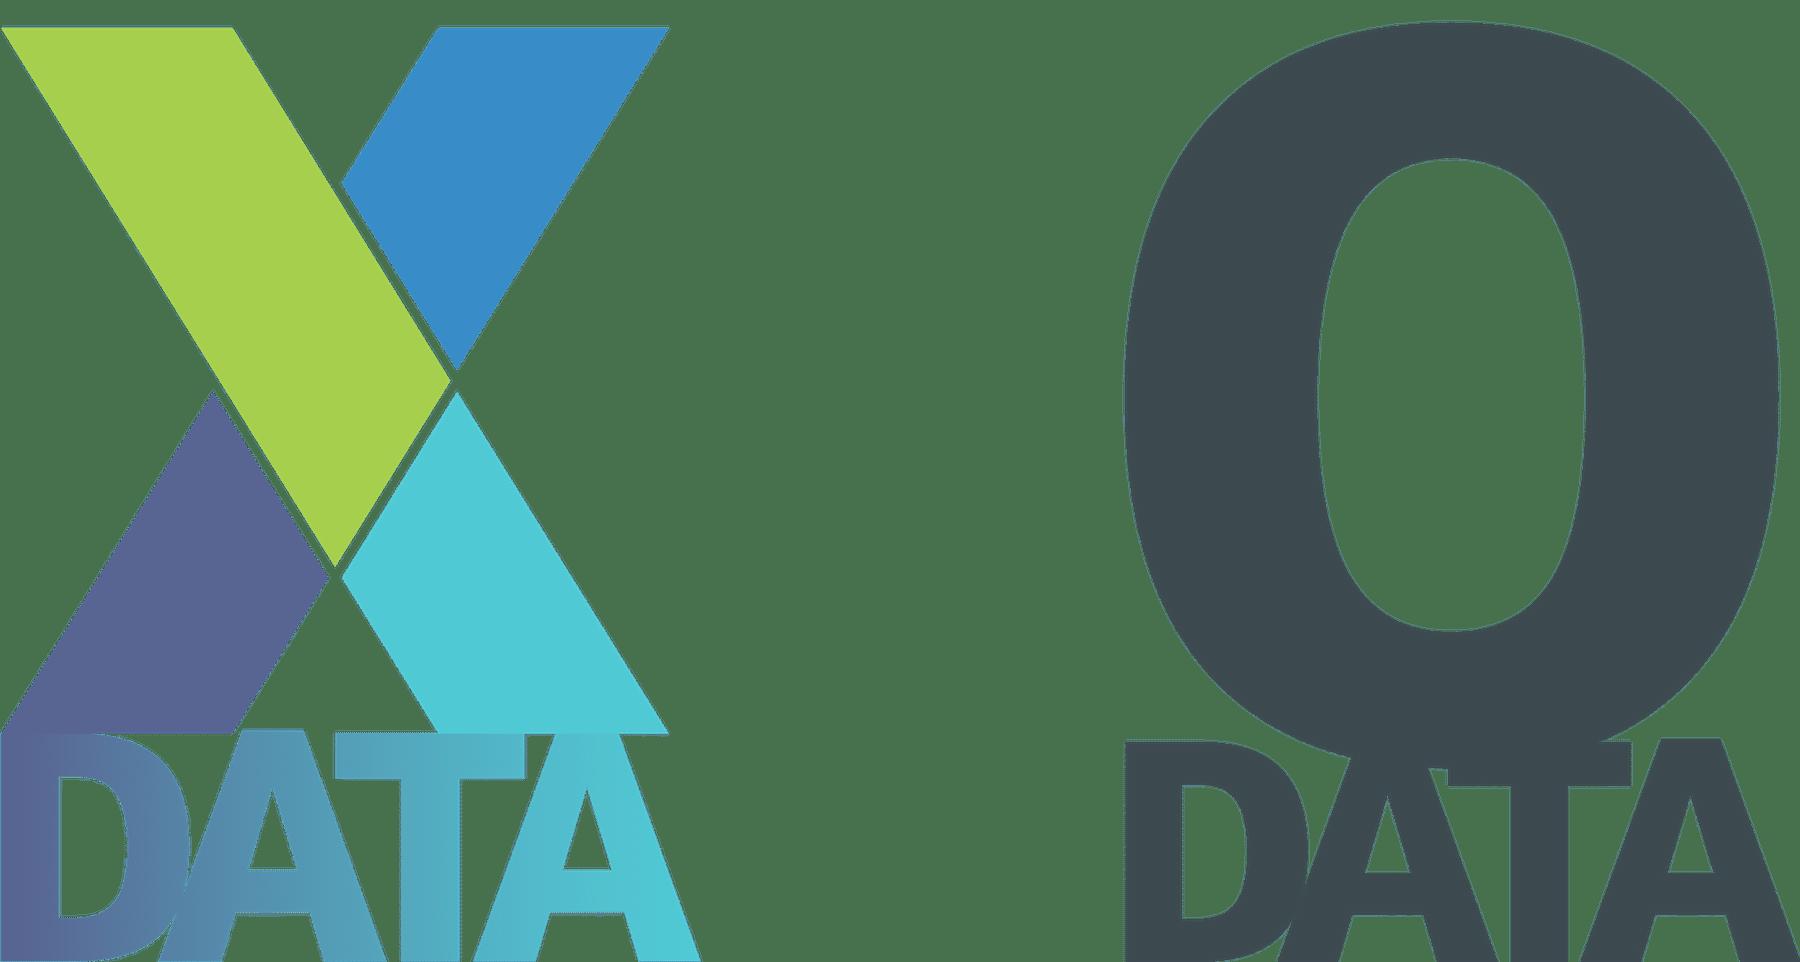 x-and-o data